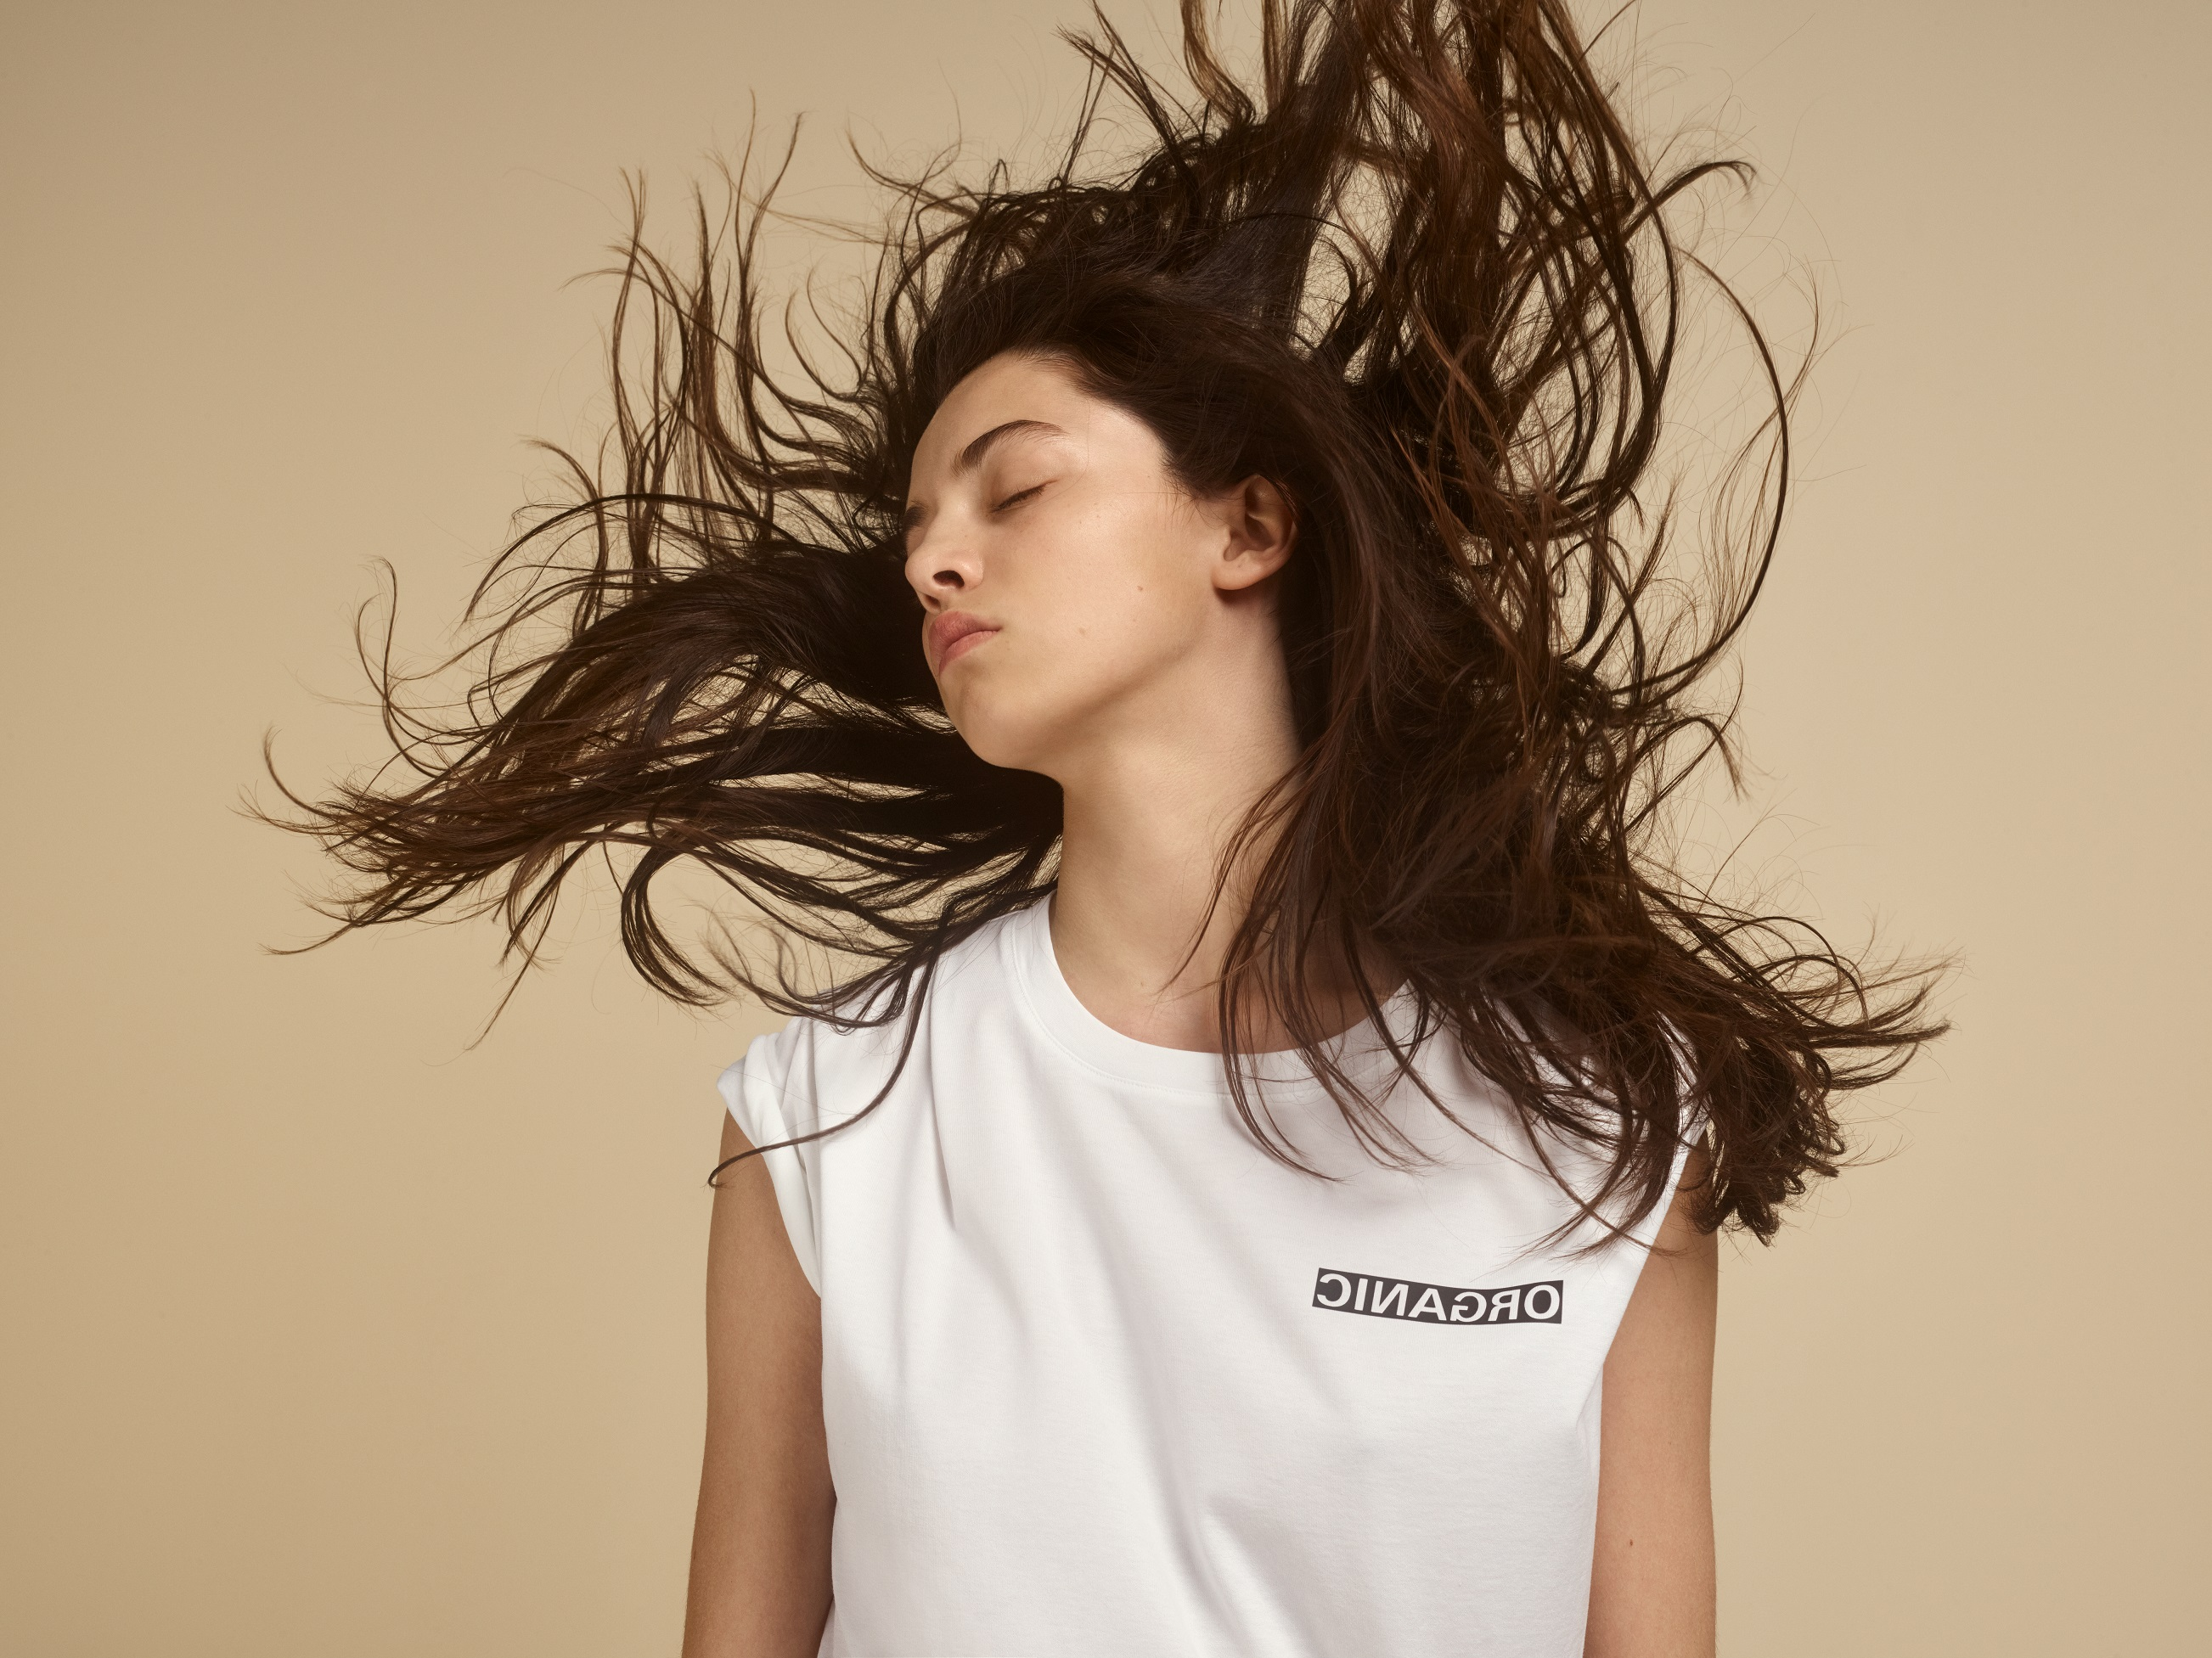 Minskad forsaljning for modebolaget rnb